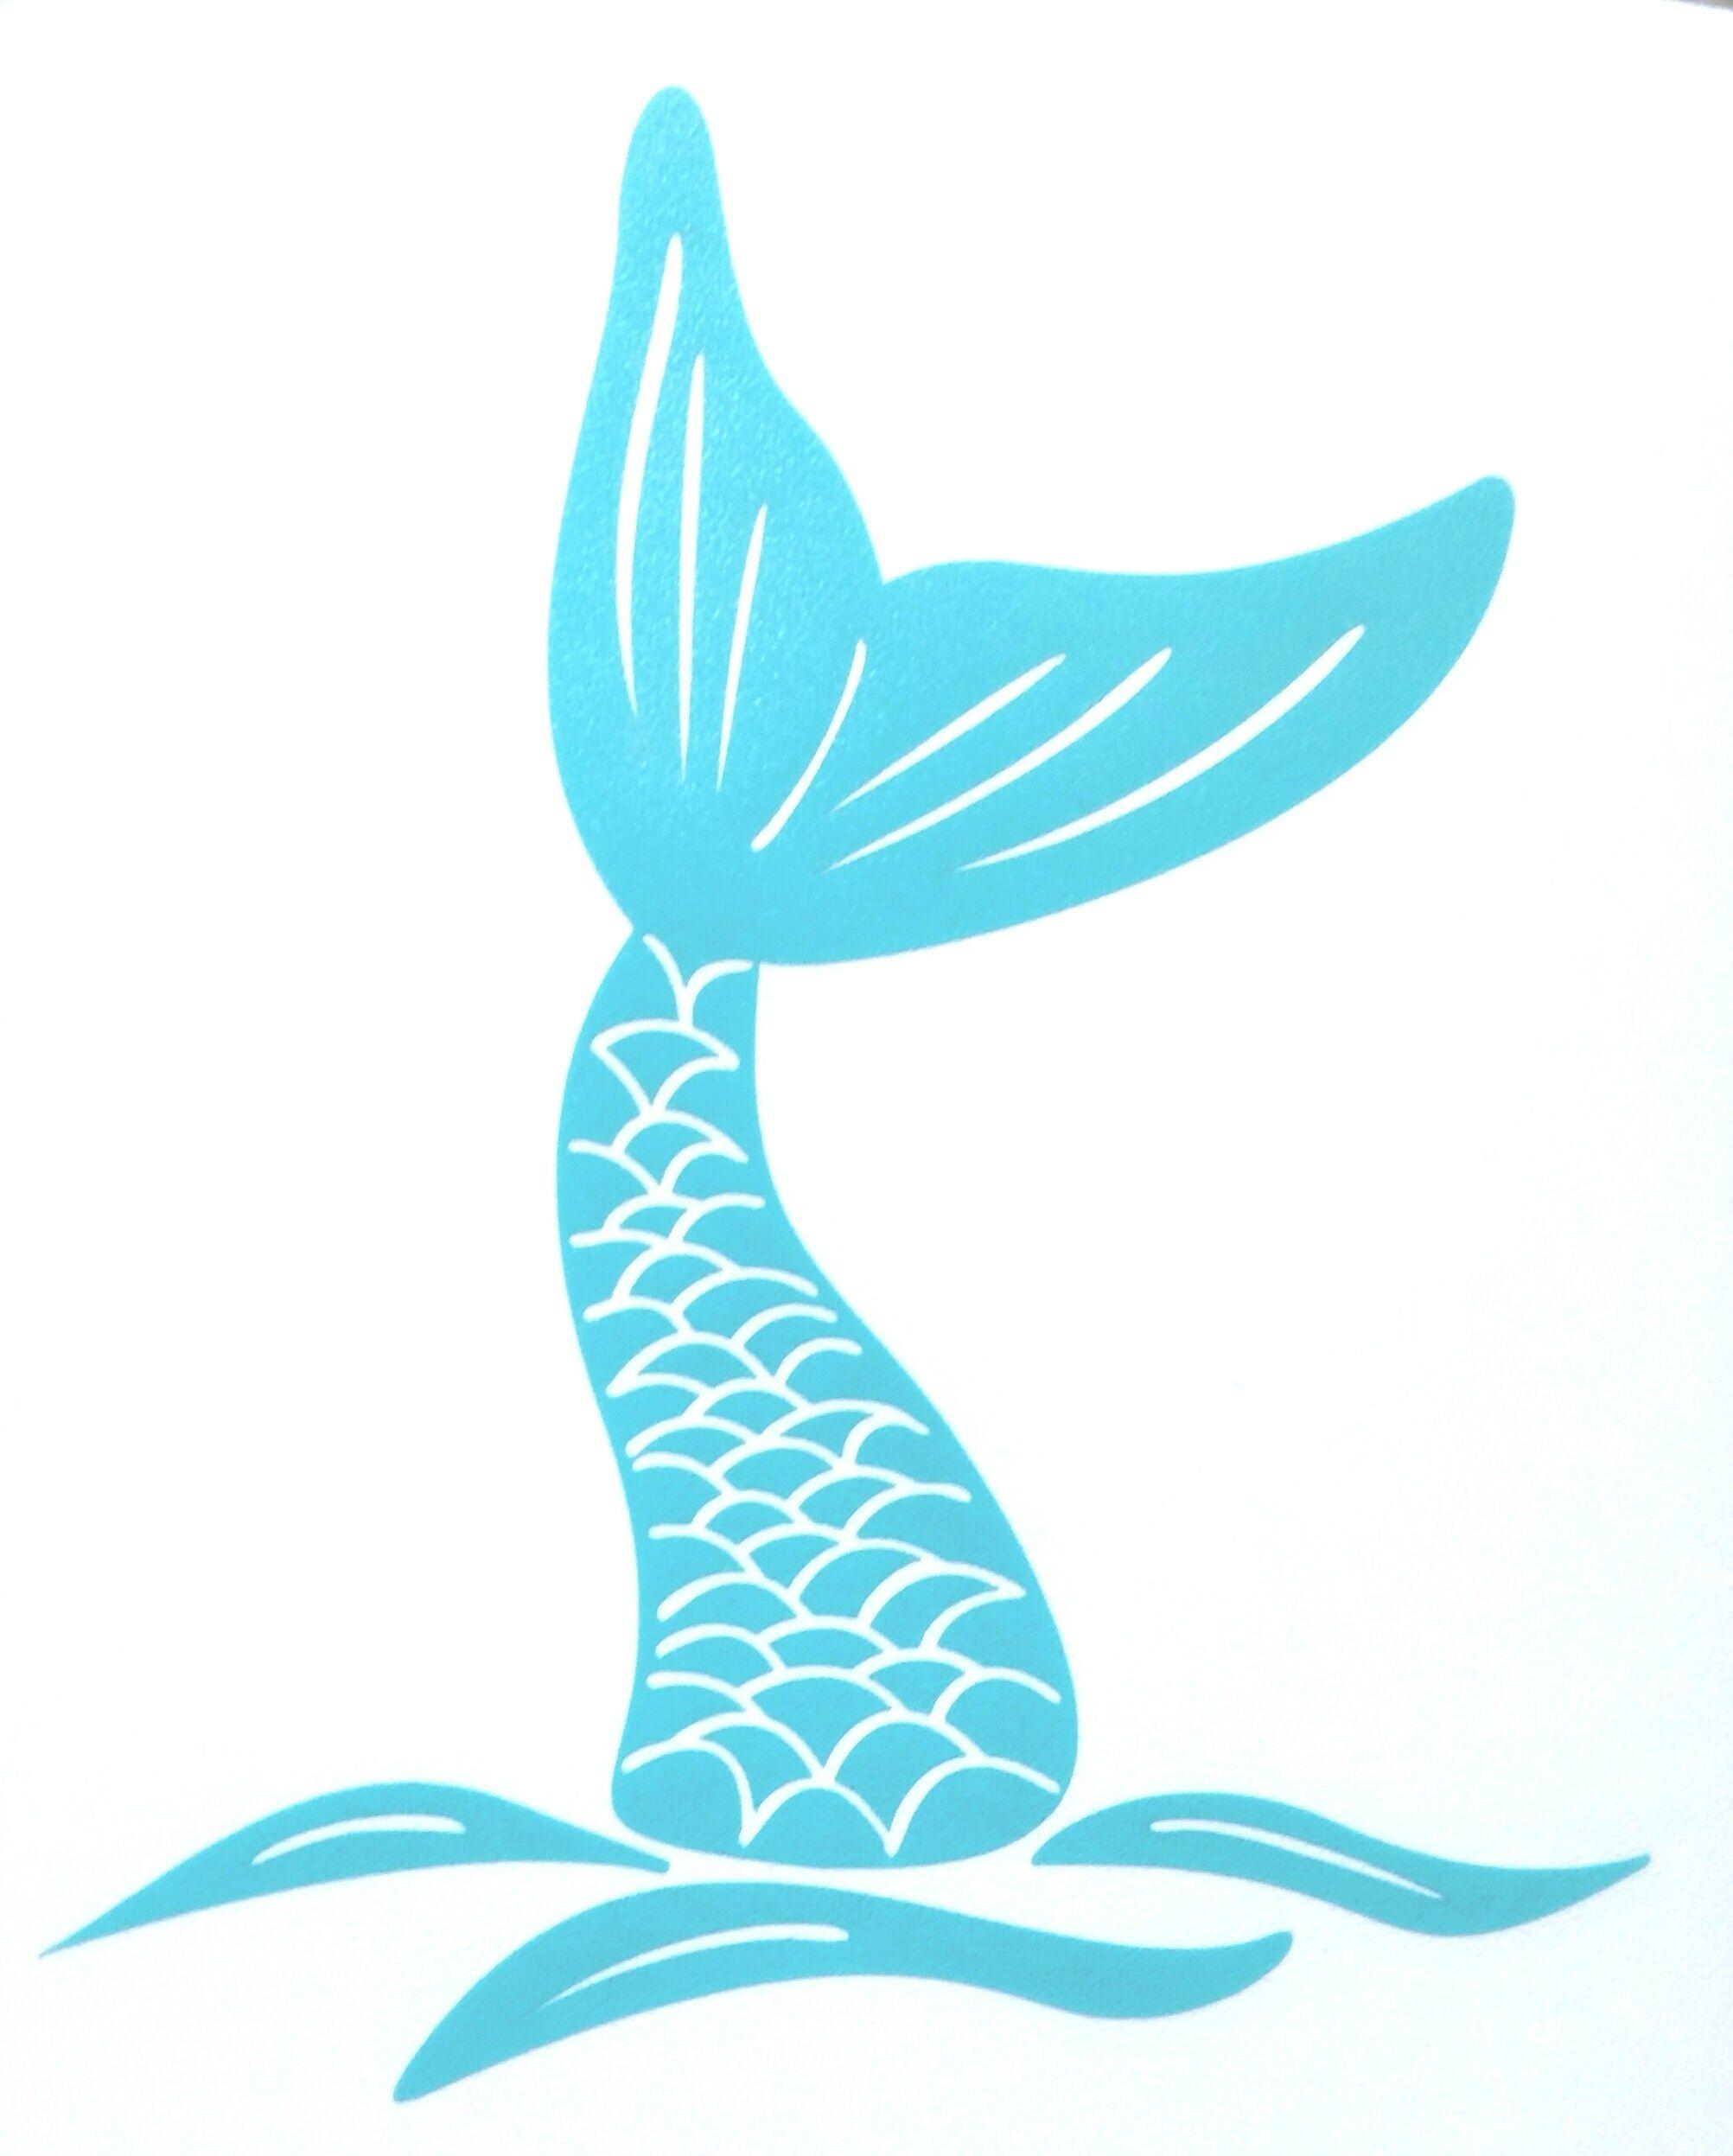 Beach Bumper Sticker Laptops for Tumblers Car Windows Custom Mermaid In The Sea Vinyl Decal Mermaid Tail Ocean Waves Design